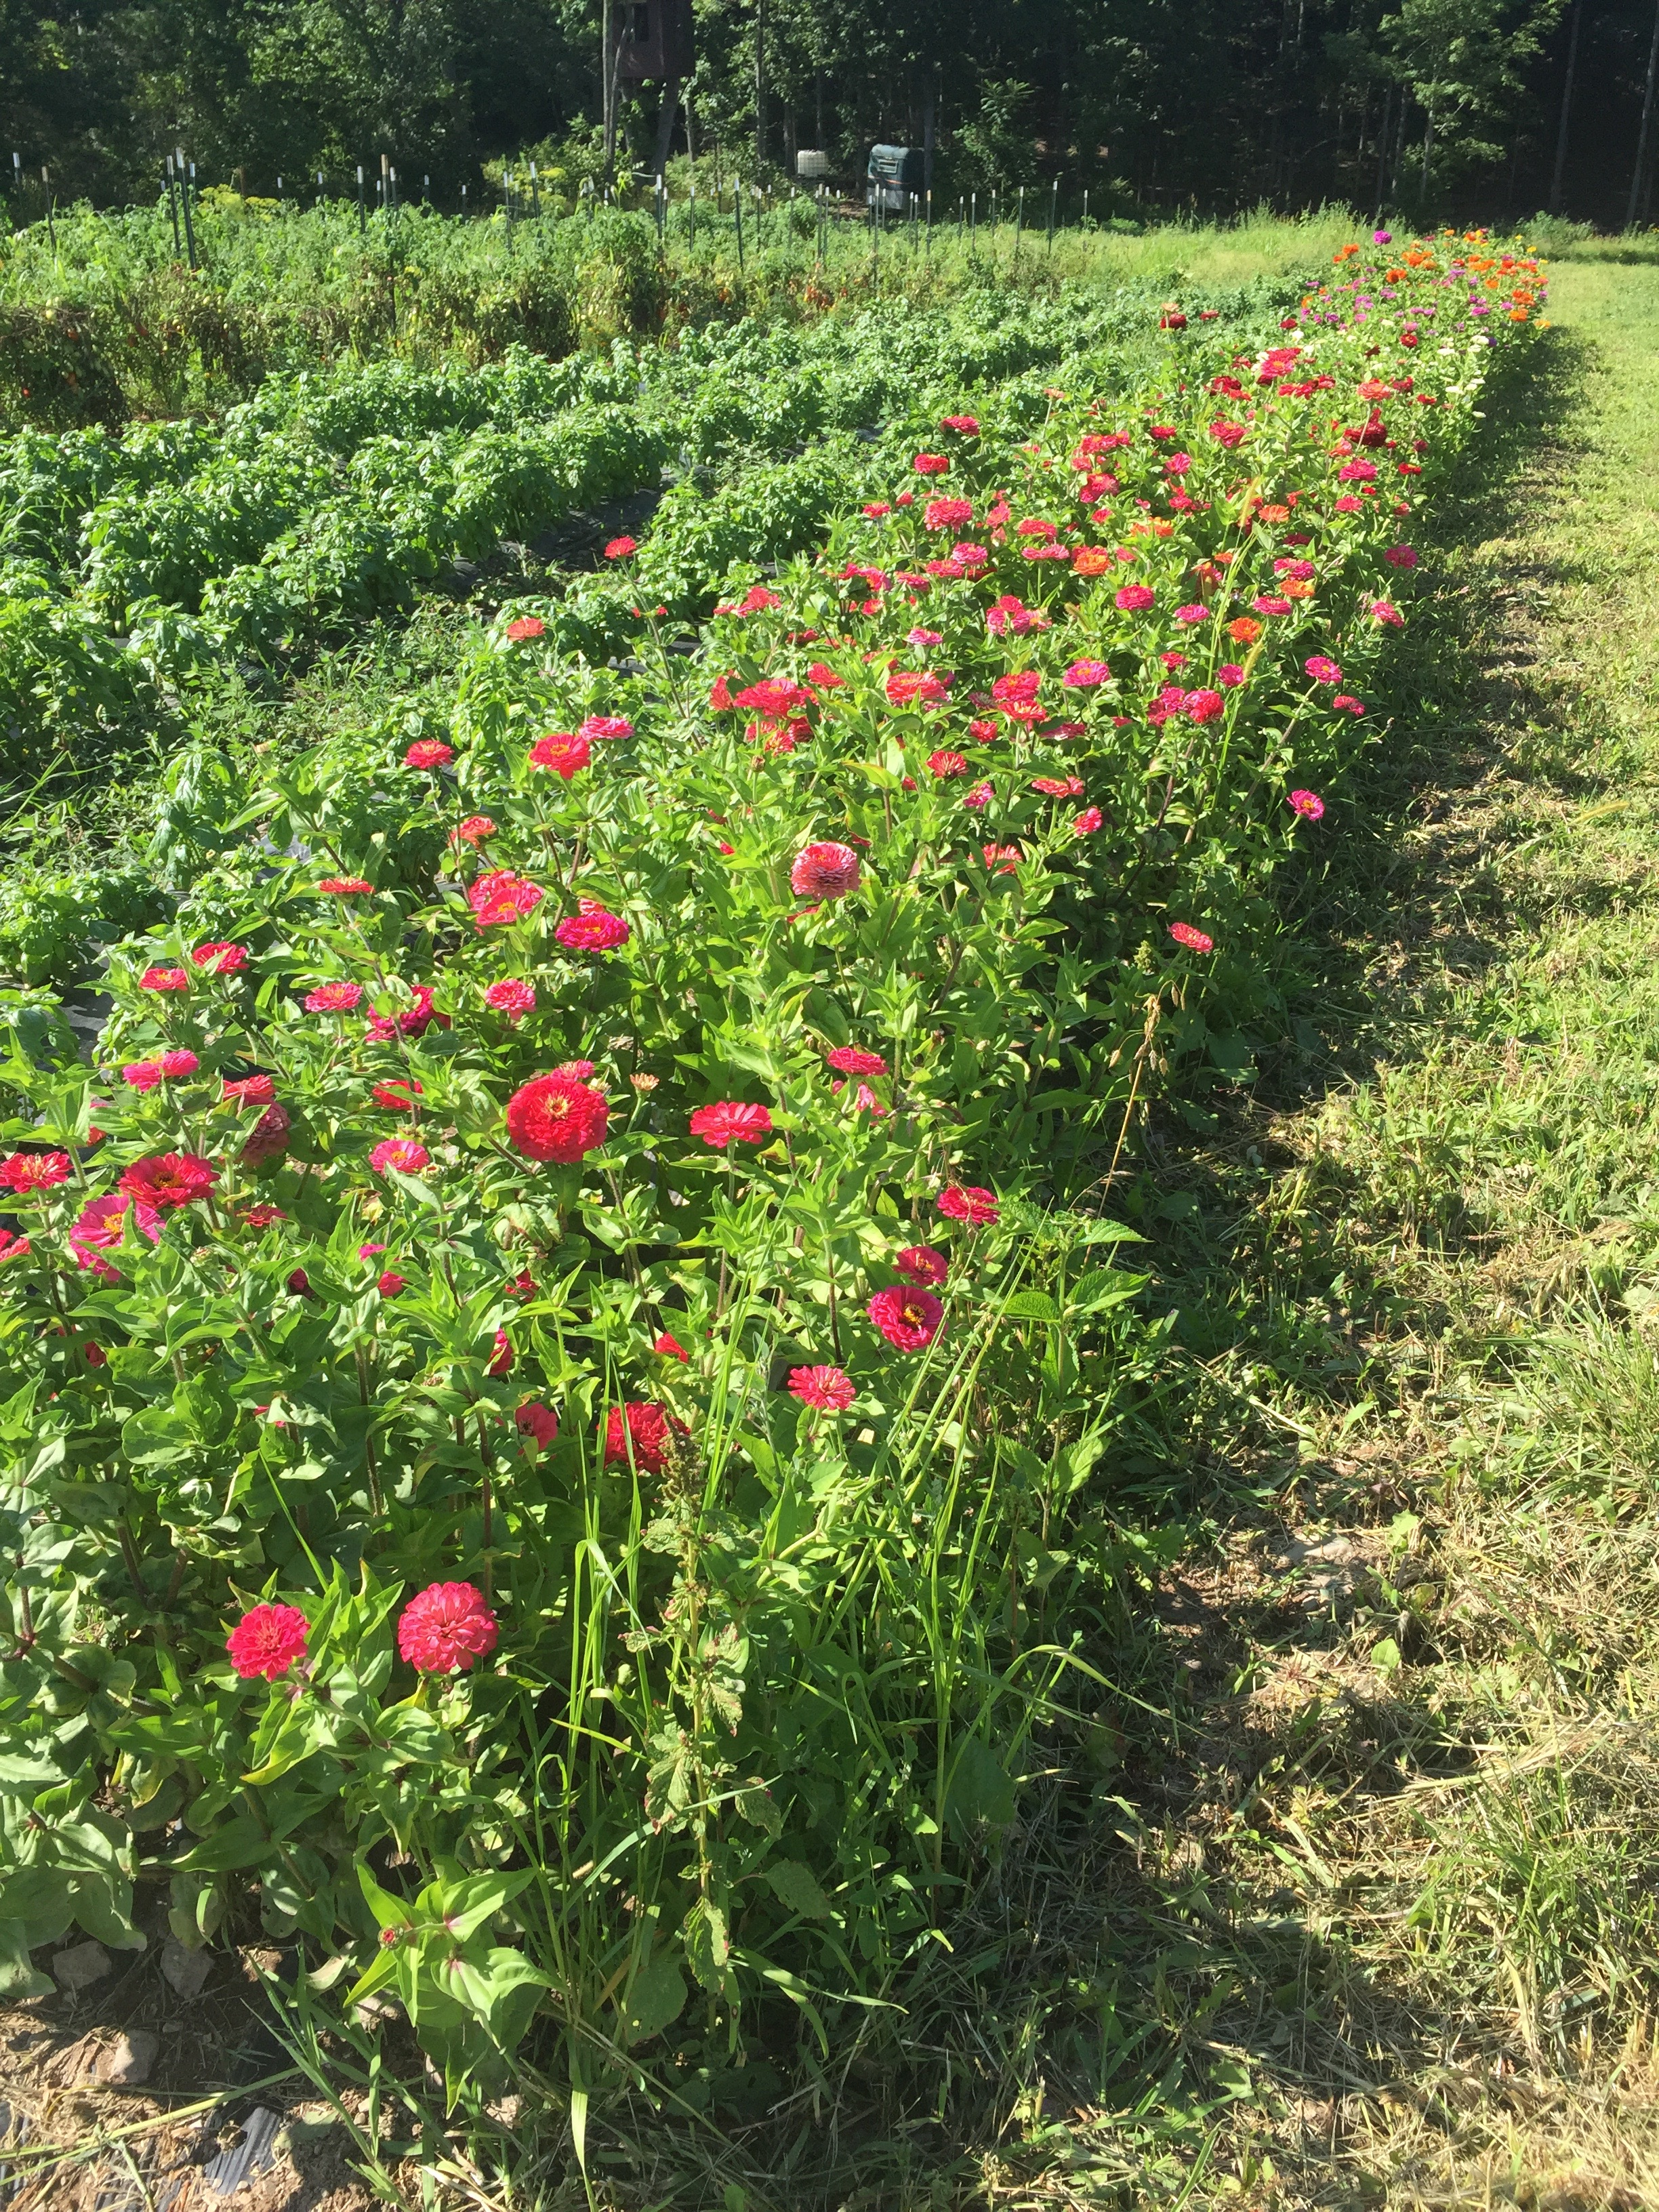 Zinnia field at East Durham Farms